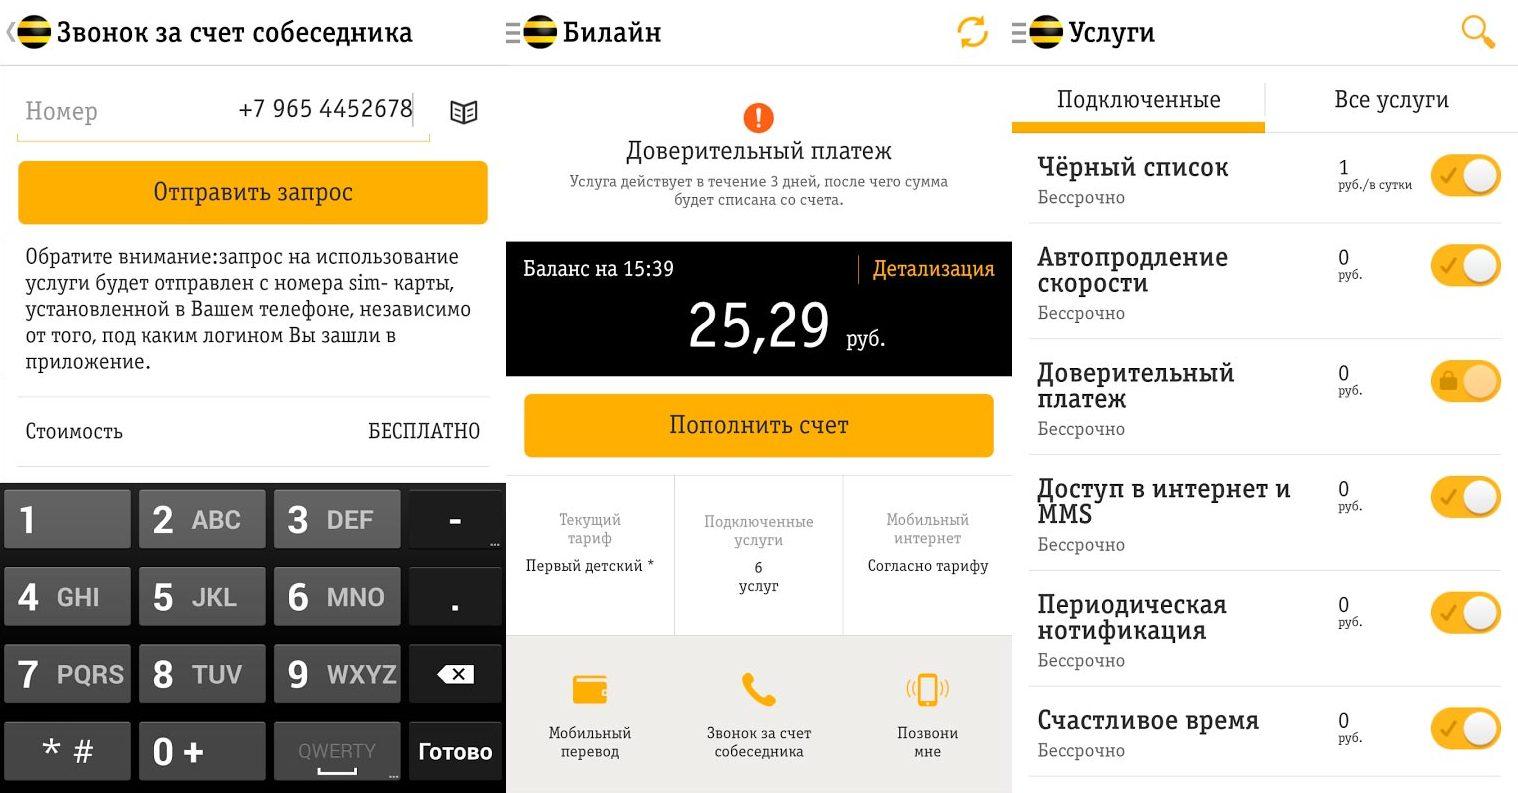 приложение Билайн текуший тариф